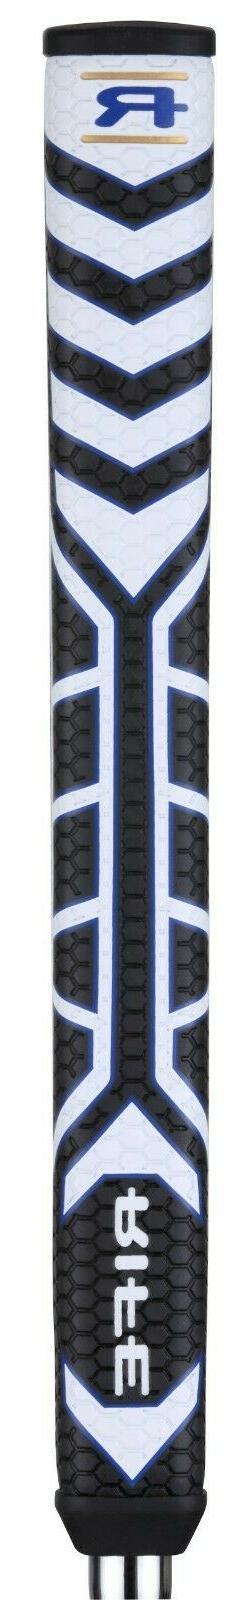 Rife Golf Technology Series Hand RG4